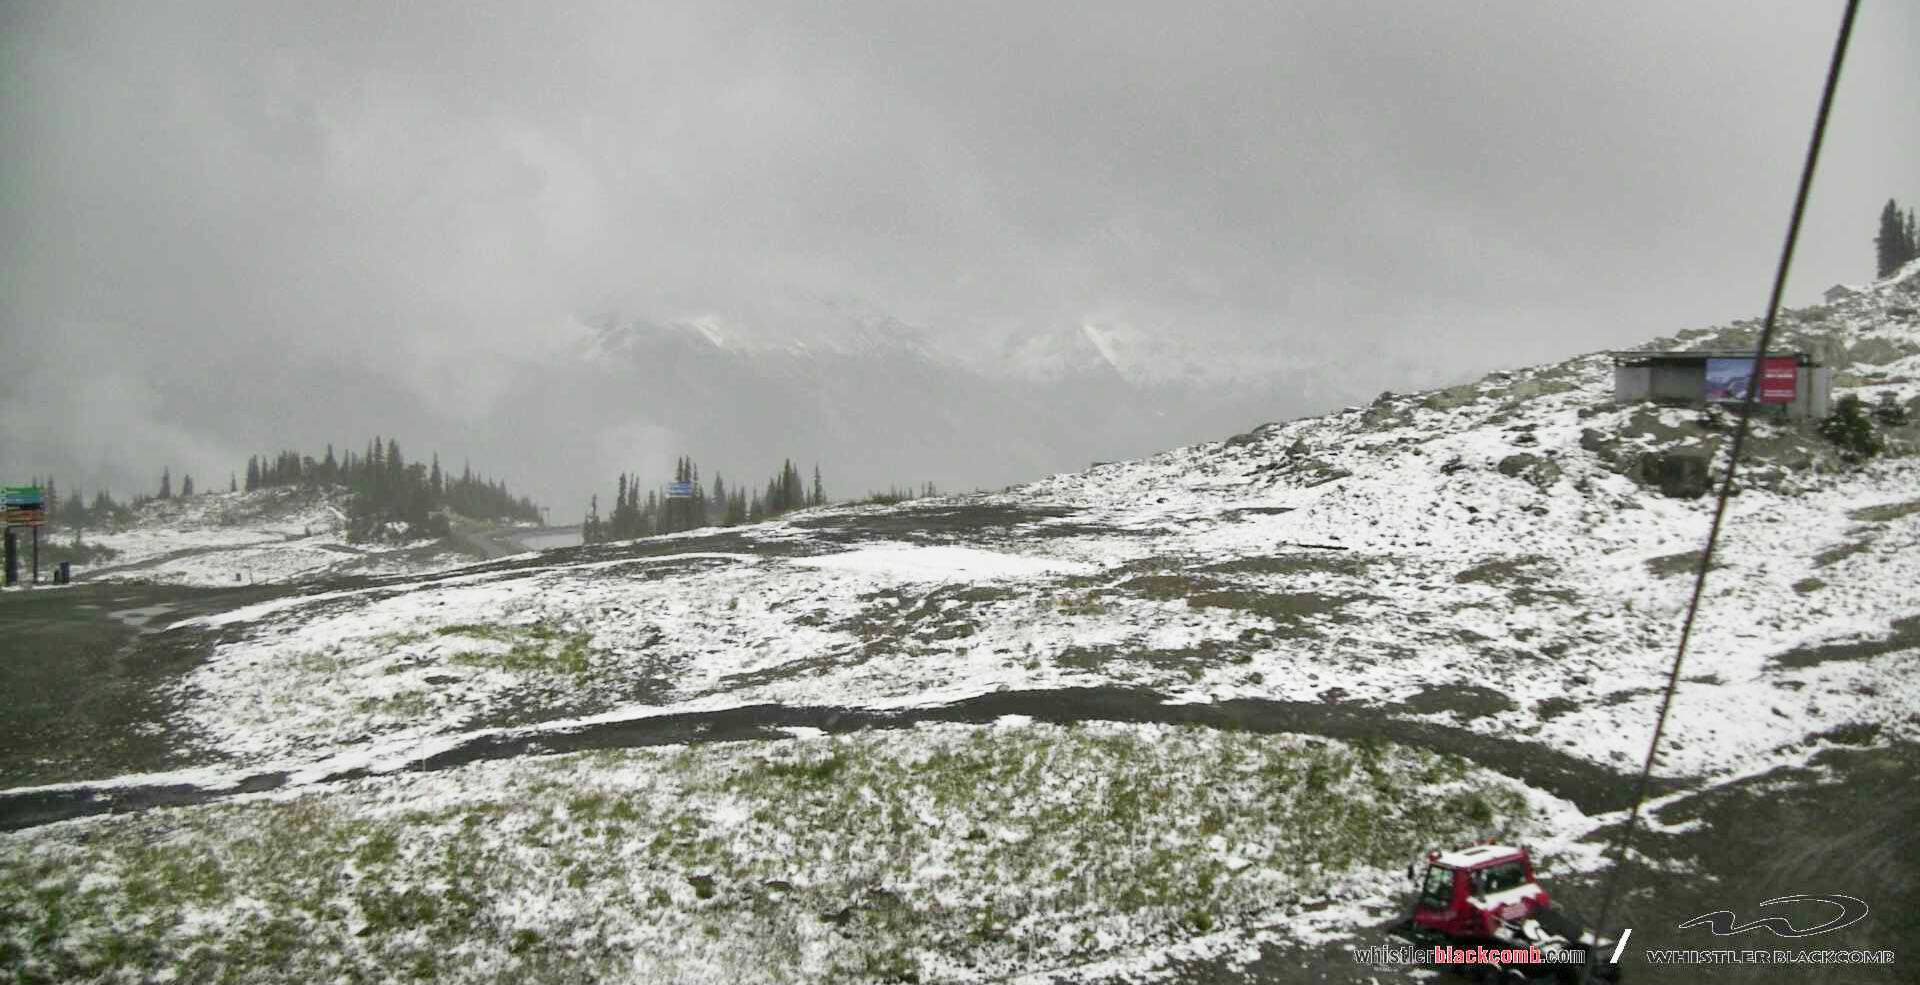 Snow on Whistler Blackcomb as of September 18, 2017 (Whistler Blackcomb)